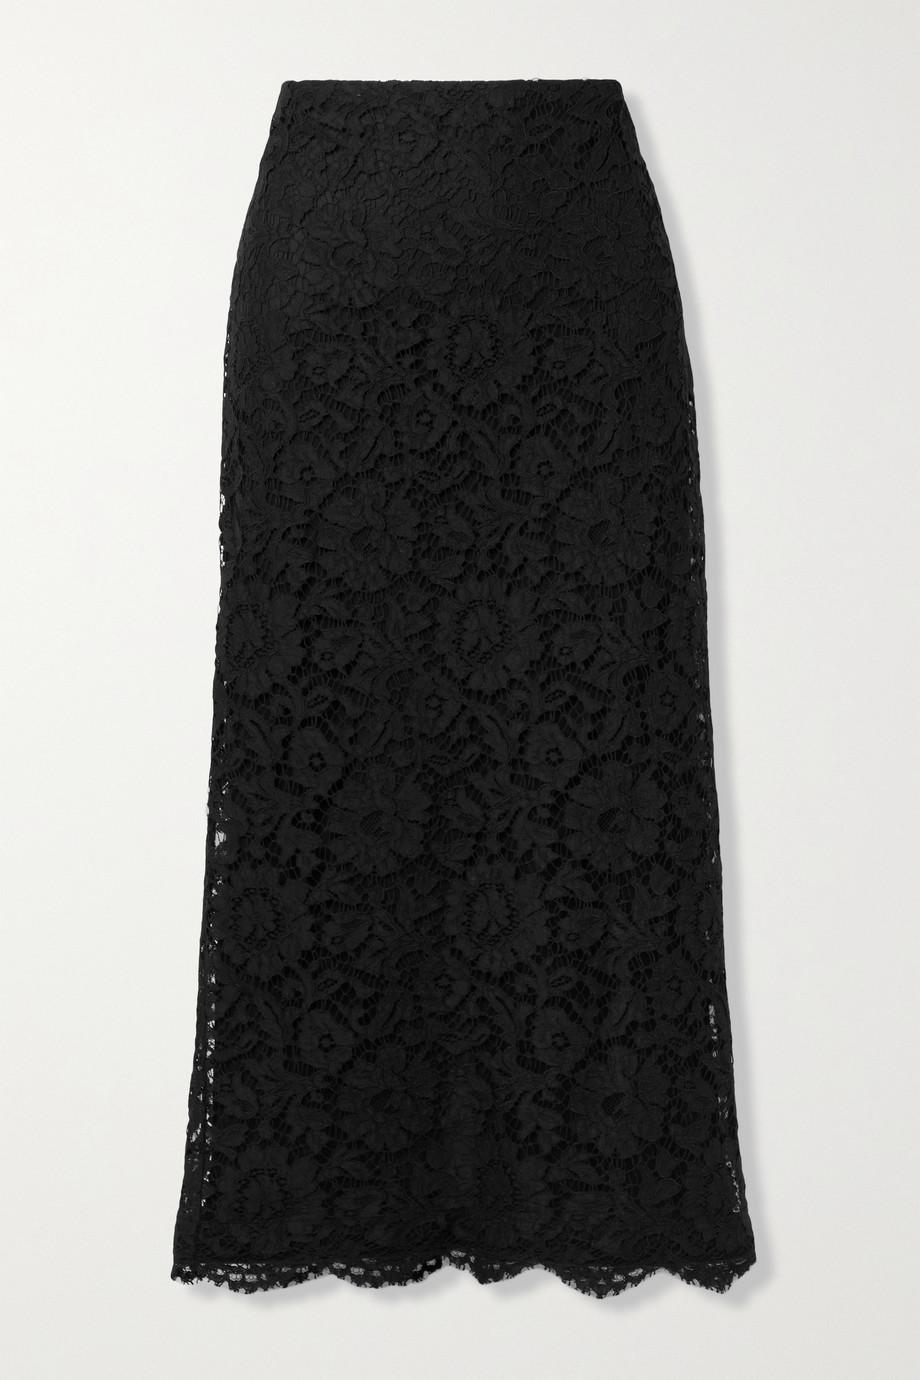 Valentino Scalloped corded lace midi skirt